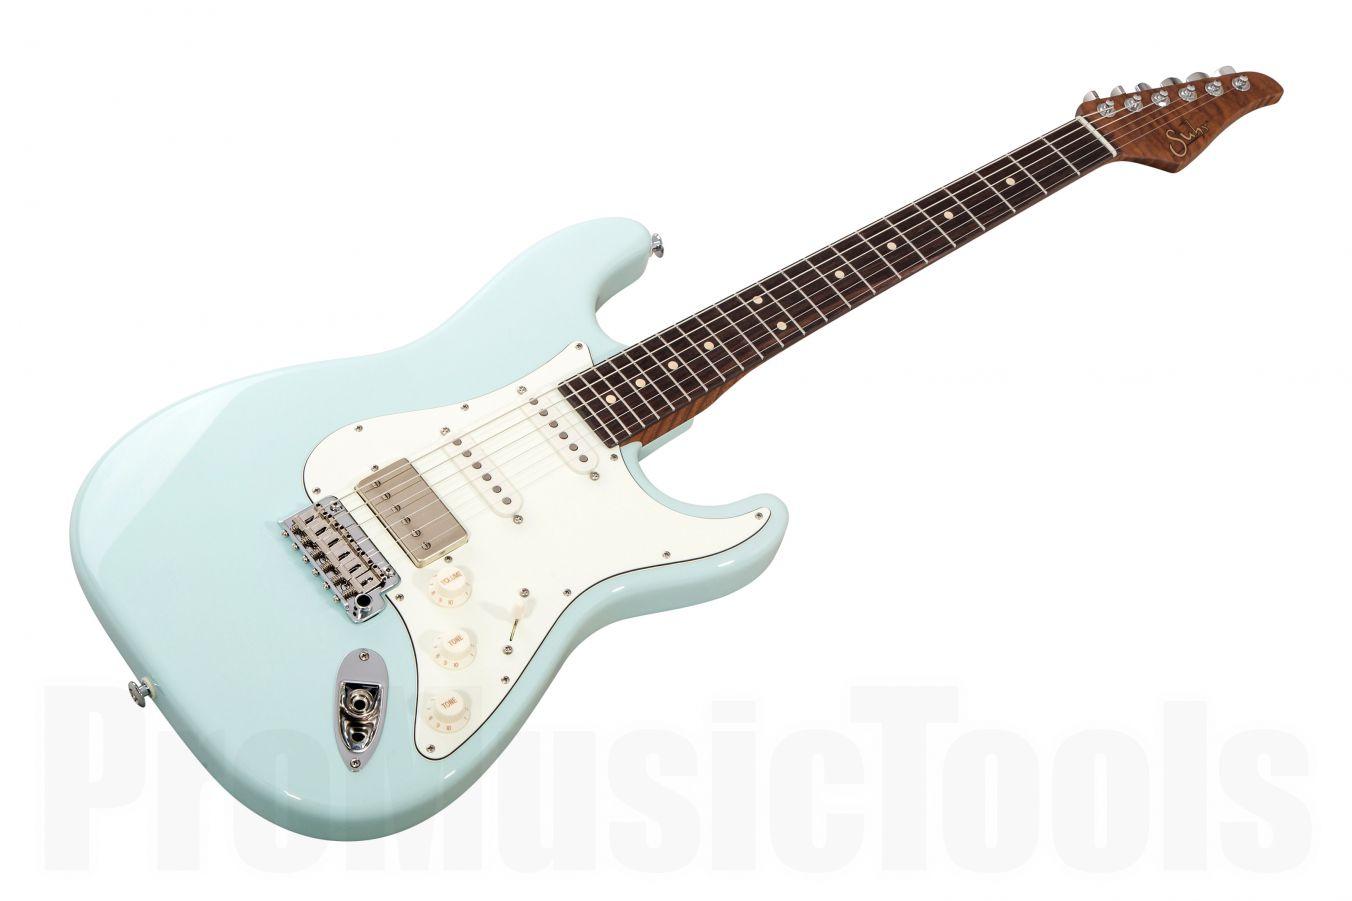 Suhr Classic S HSS Custom Ltd Roasted Flamed Maple SB - Sonic Blue RW